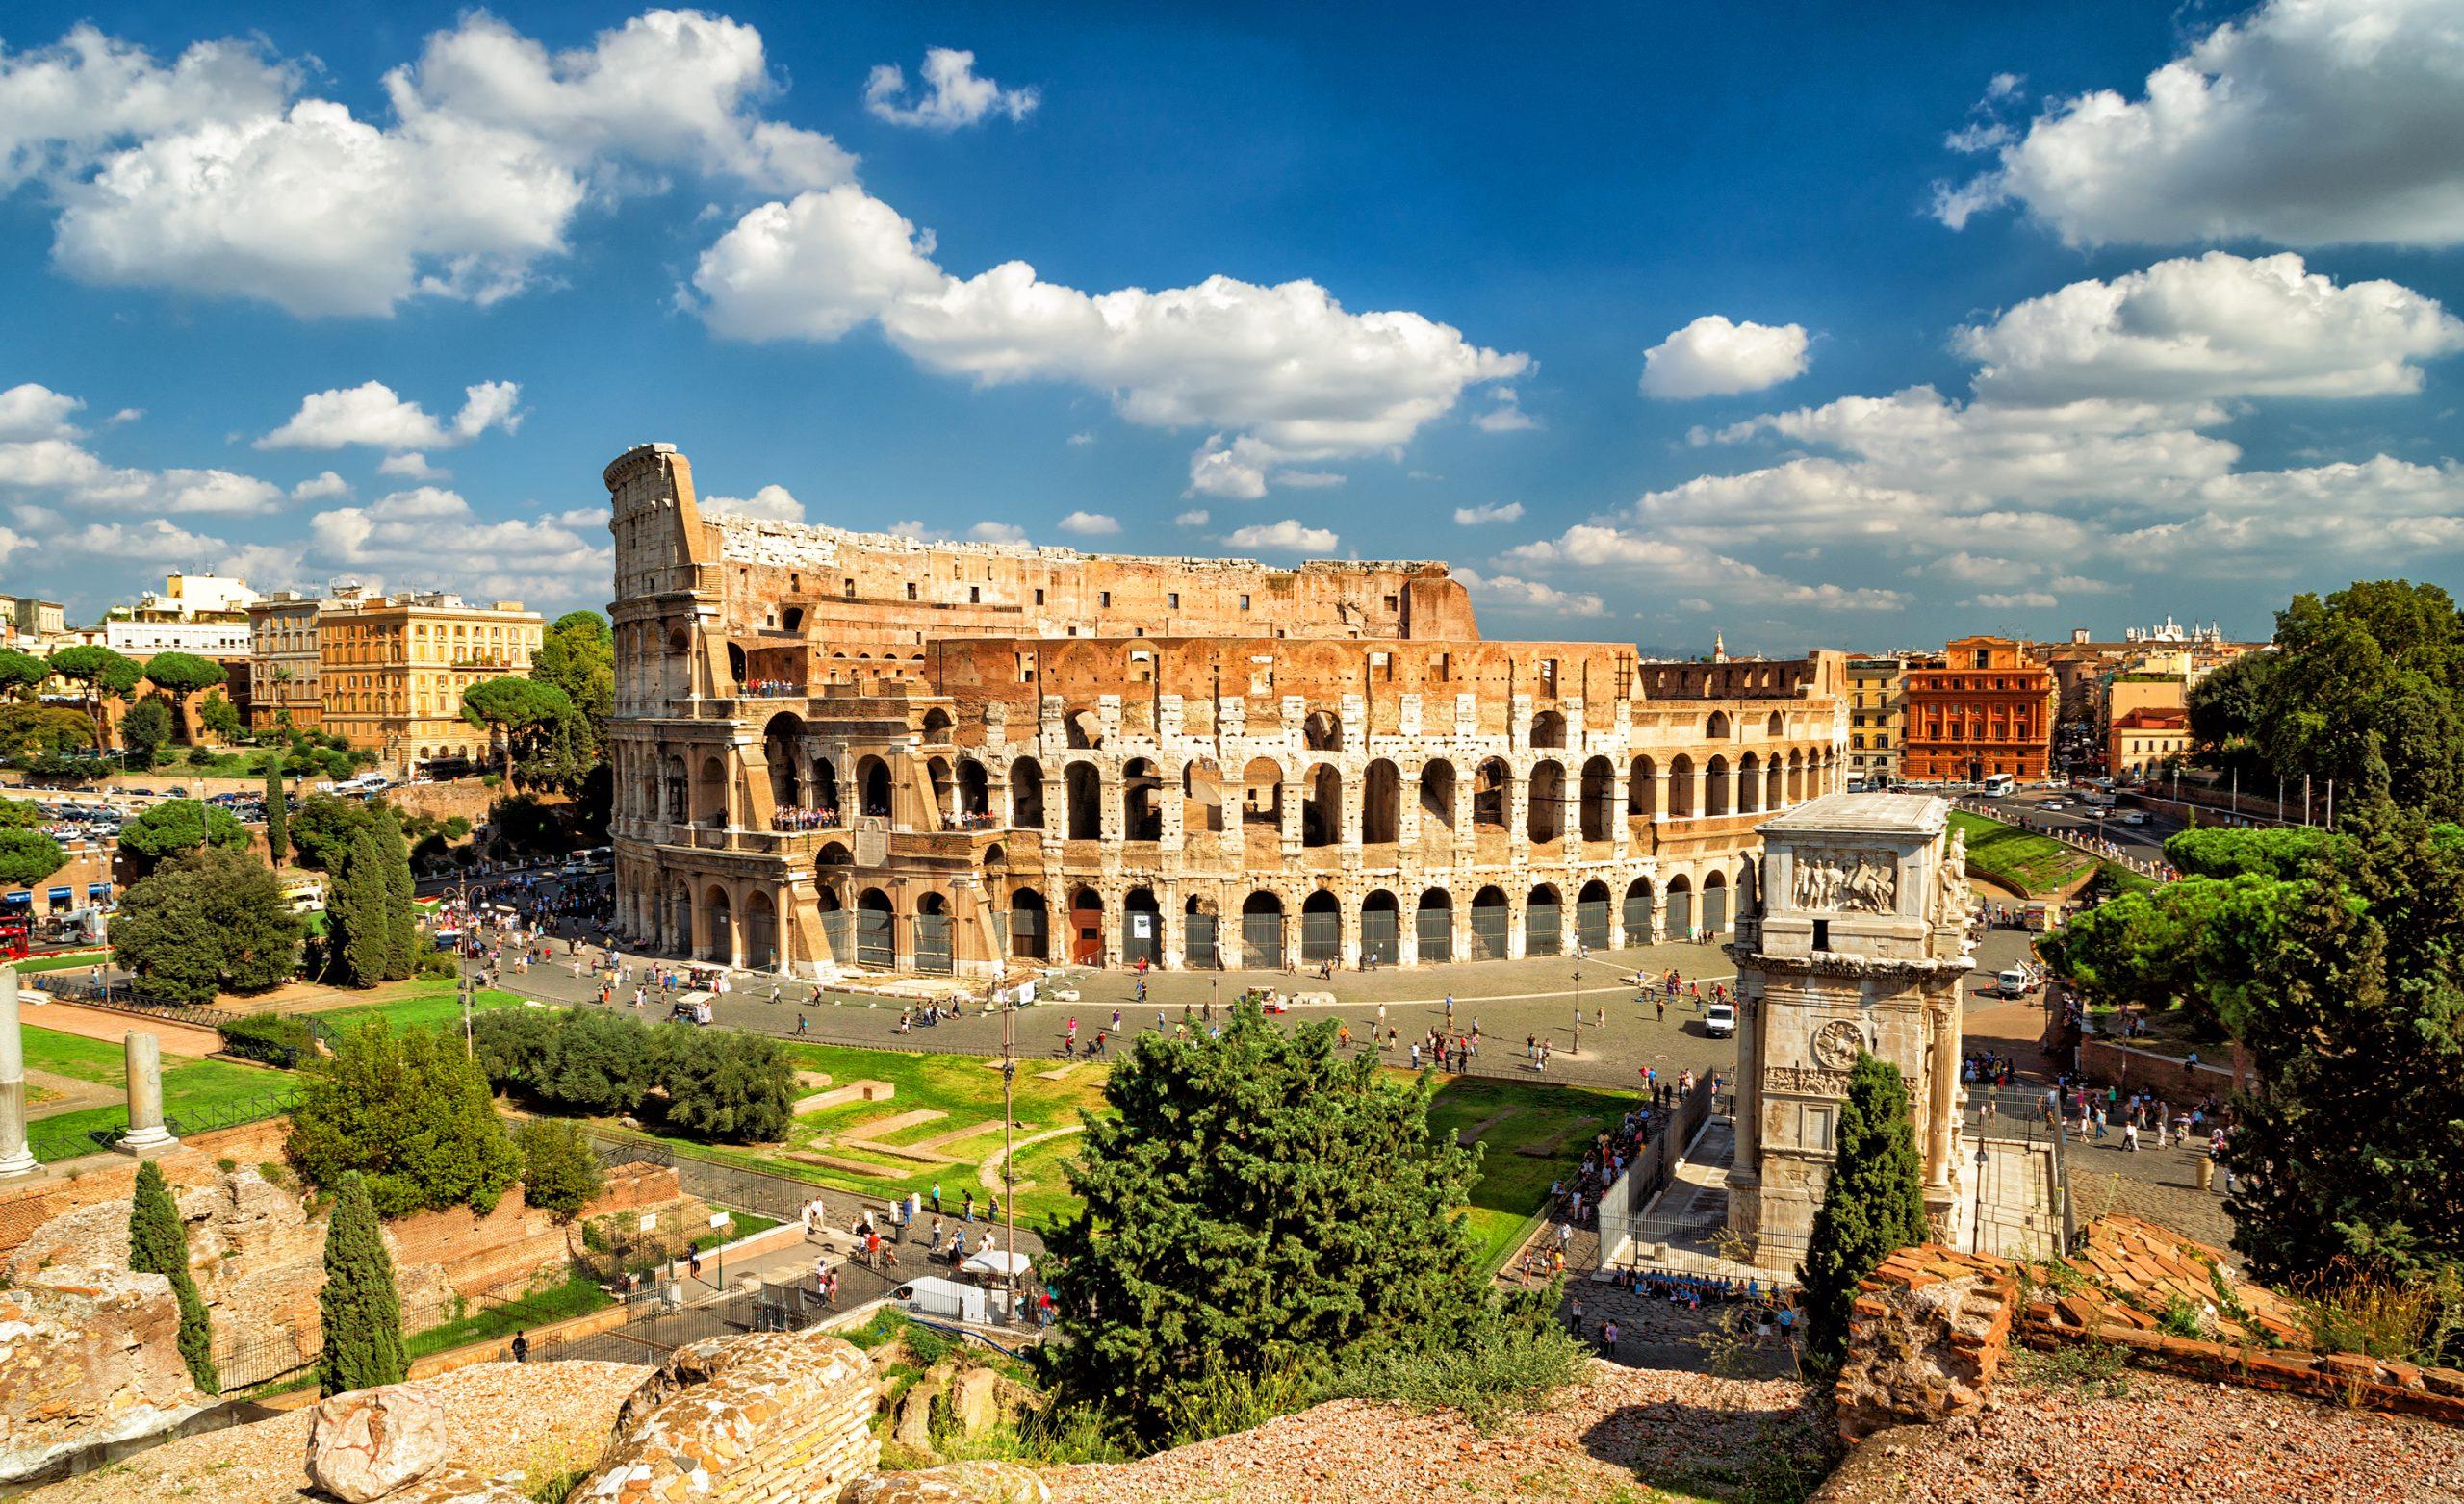 Colosseum_Ancient Rome (3)